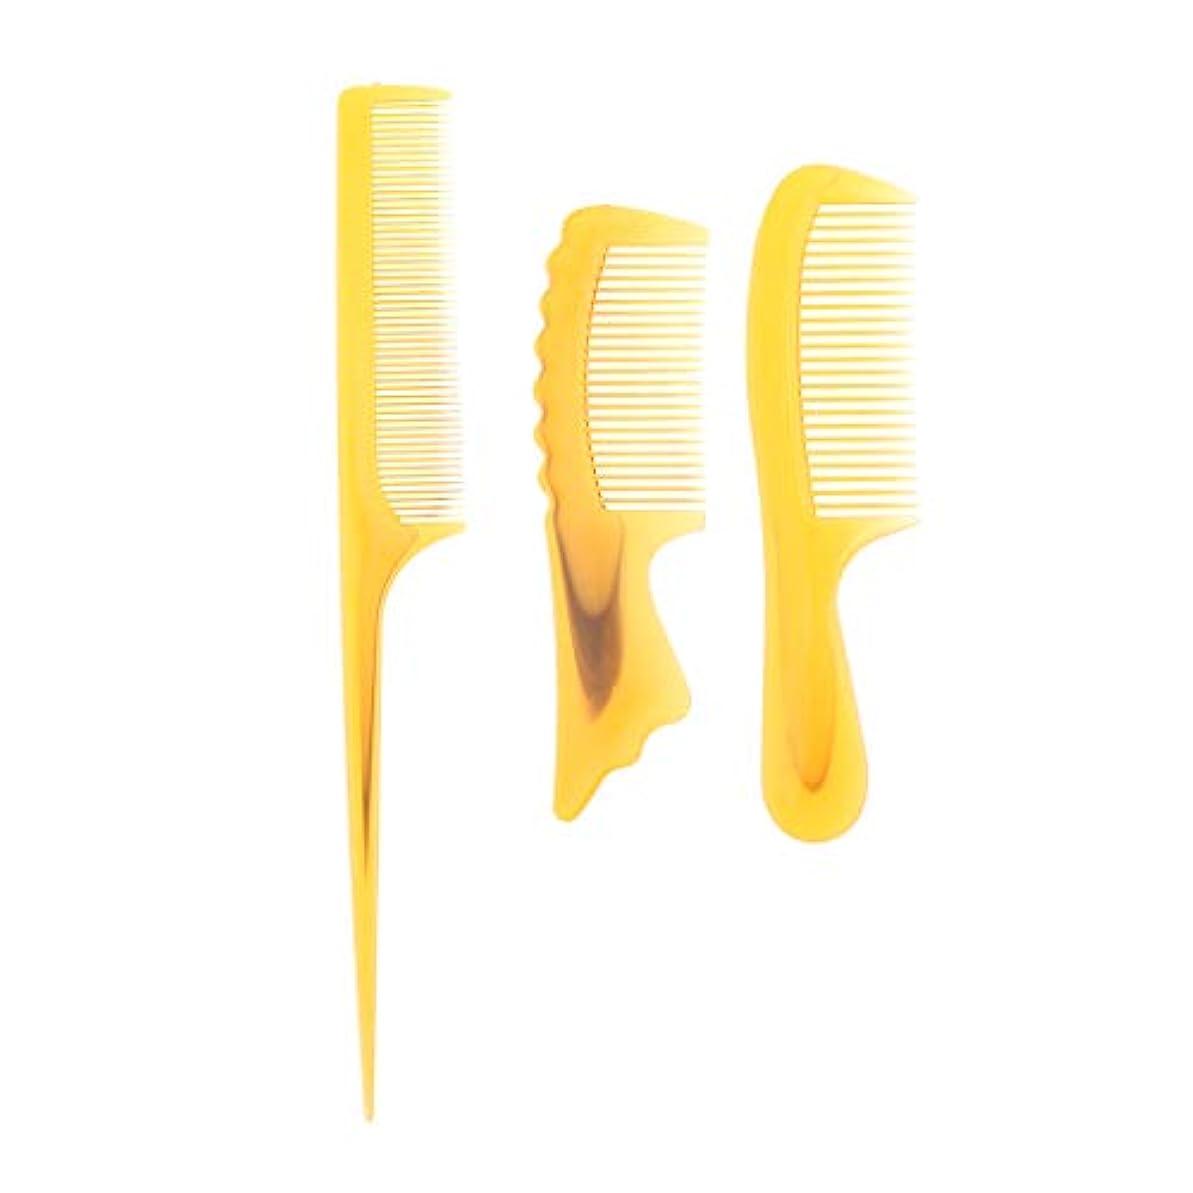 B Baosity 3個 ヘアコーム 静電防止櫛 コーム 理髪 美容師 ヘアケア